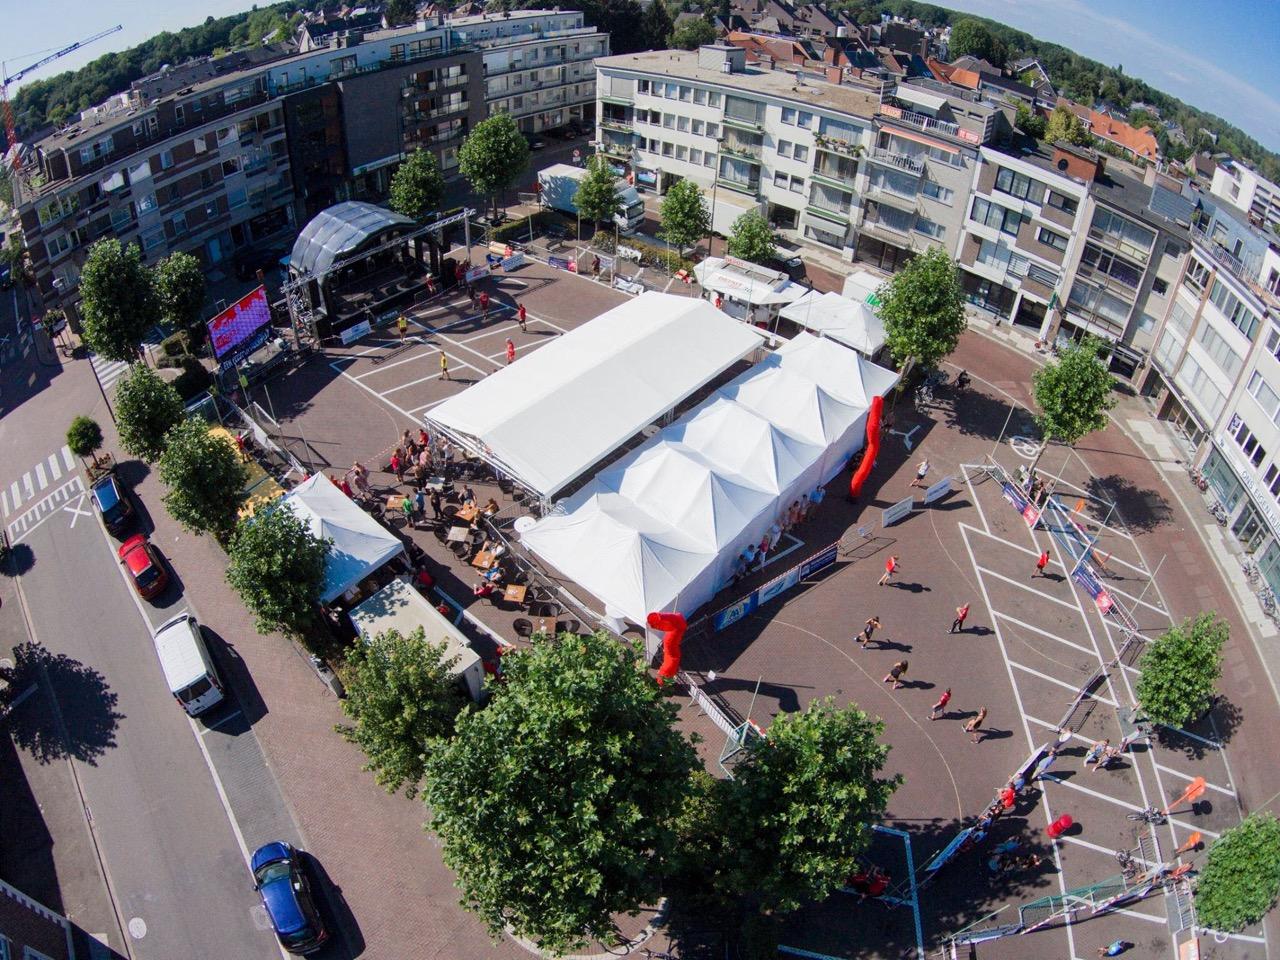 drone photo SH street handball event sporting nelo belgium 2015 2